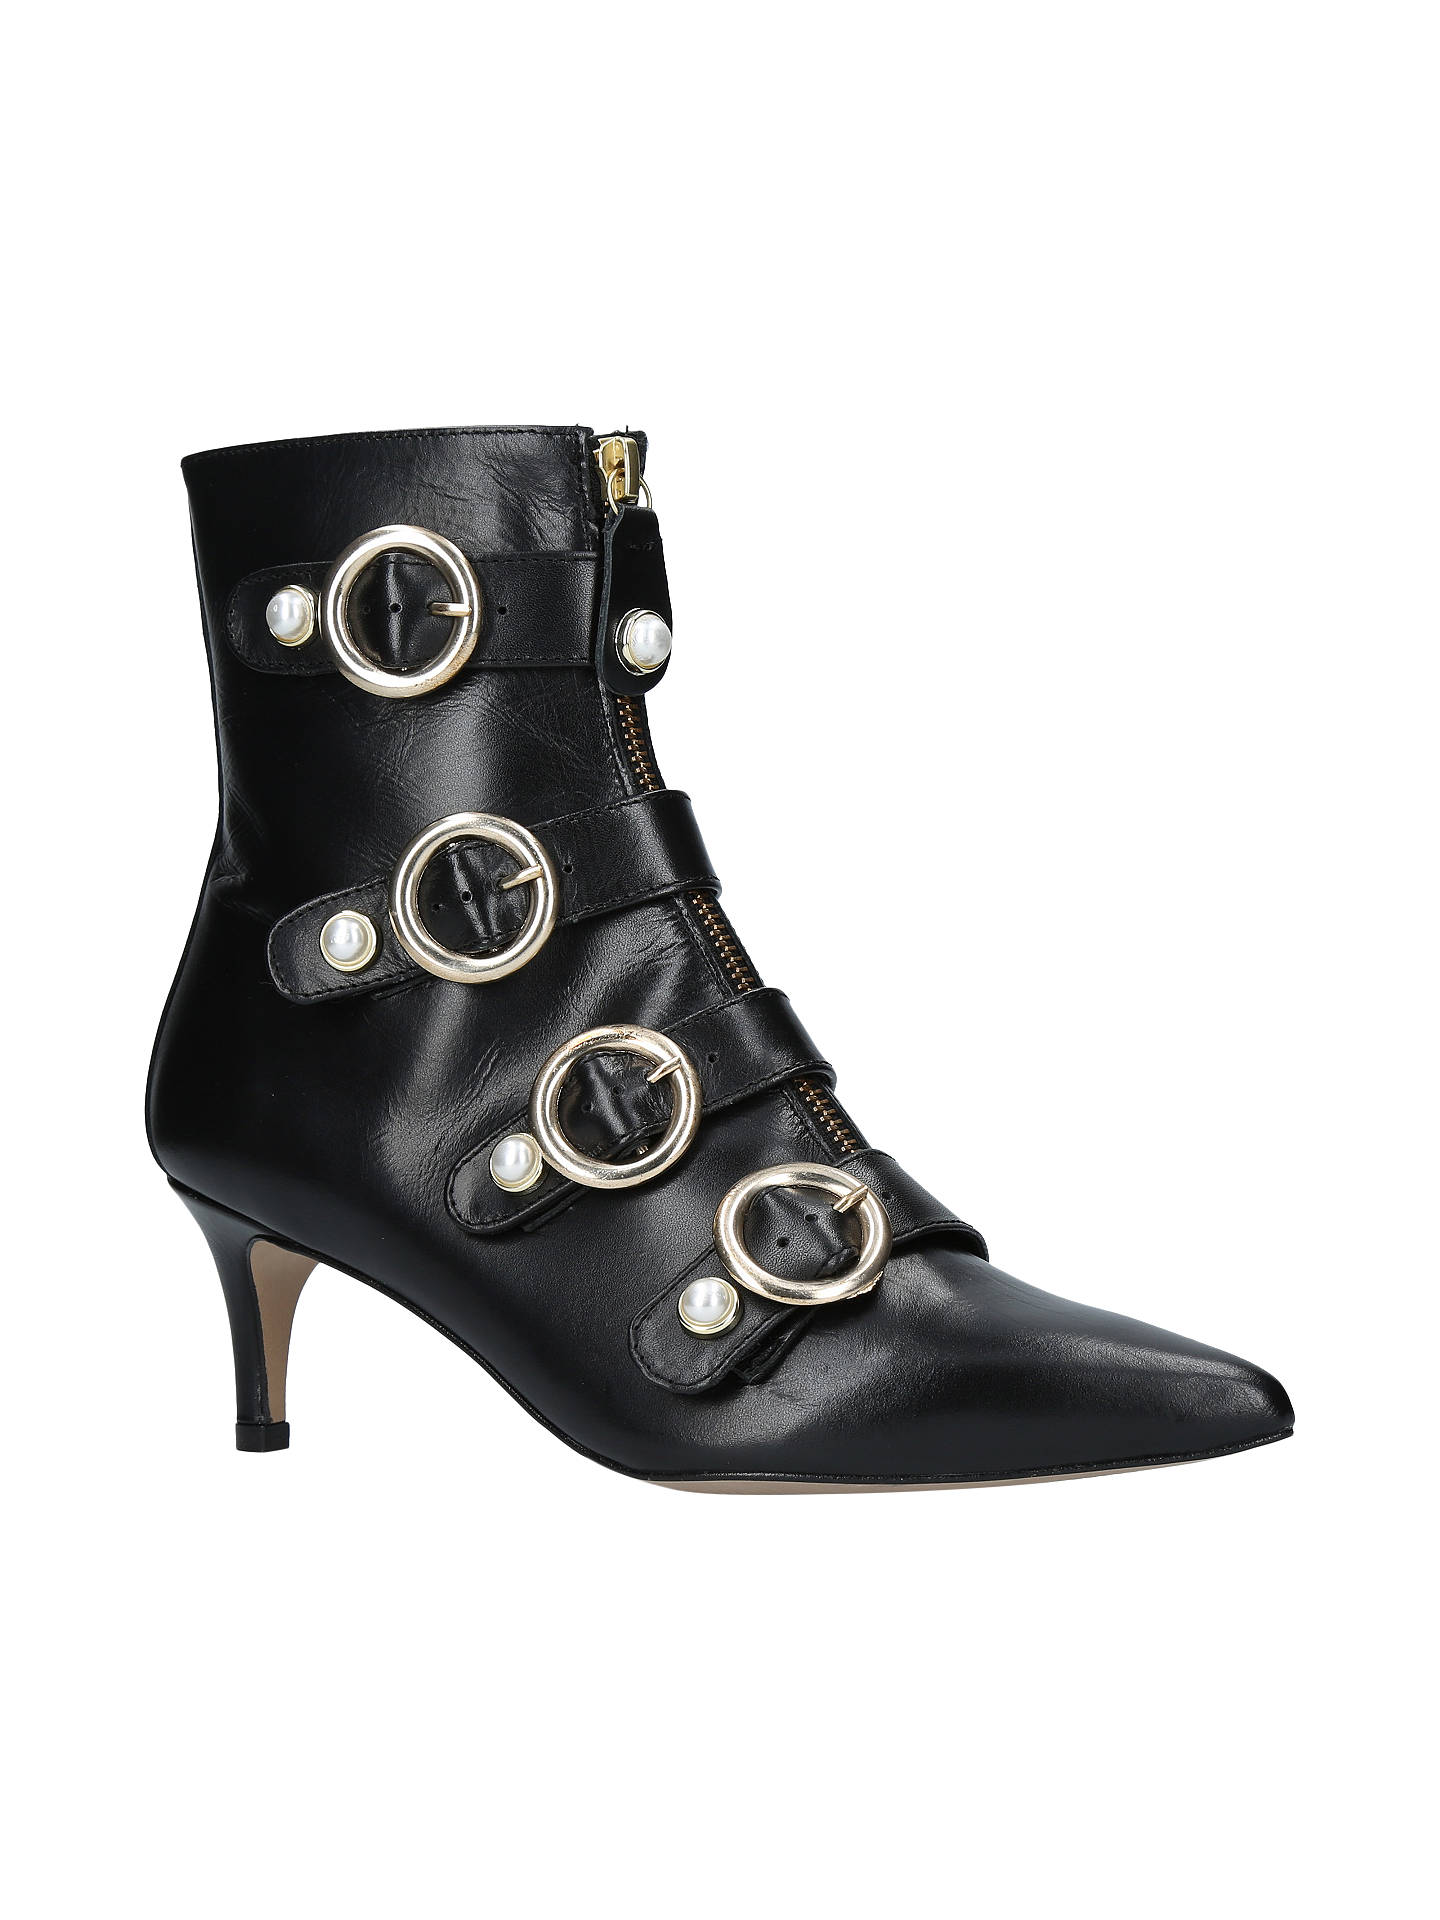 d2ea258c922c Buy Carvela Sparky Kitten Heeled Ankle Boots